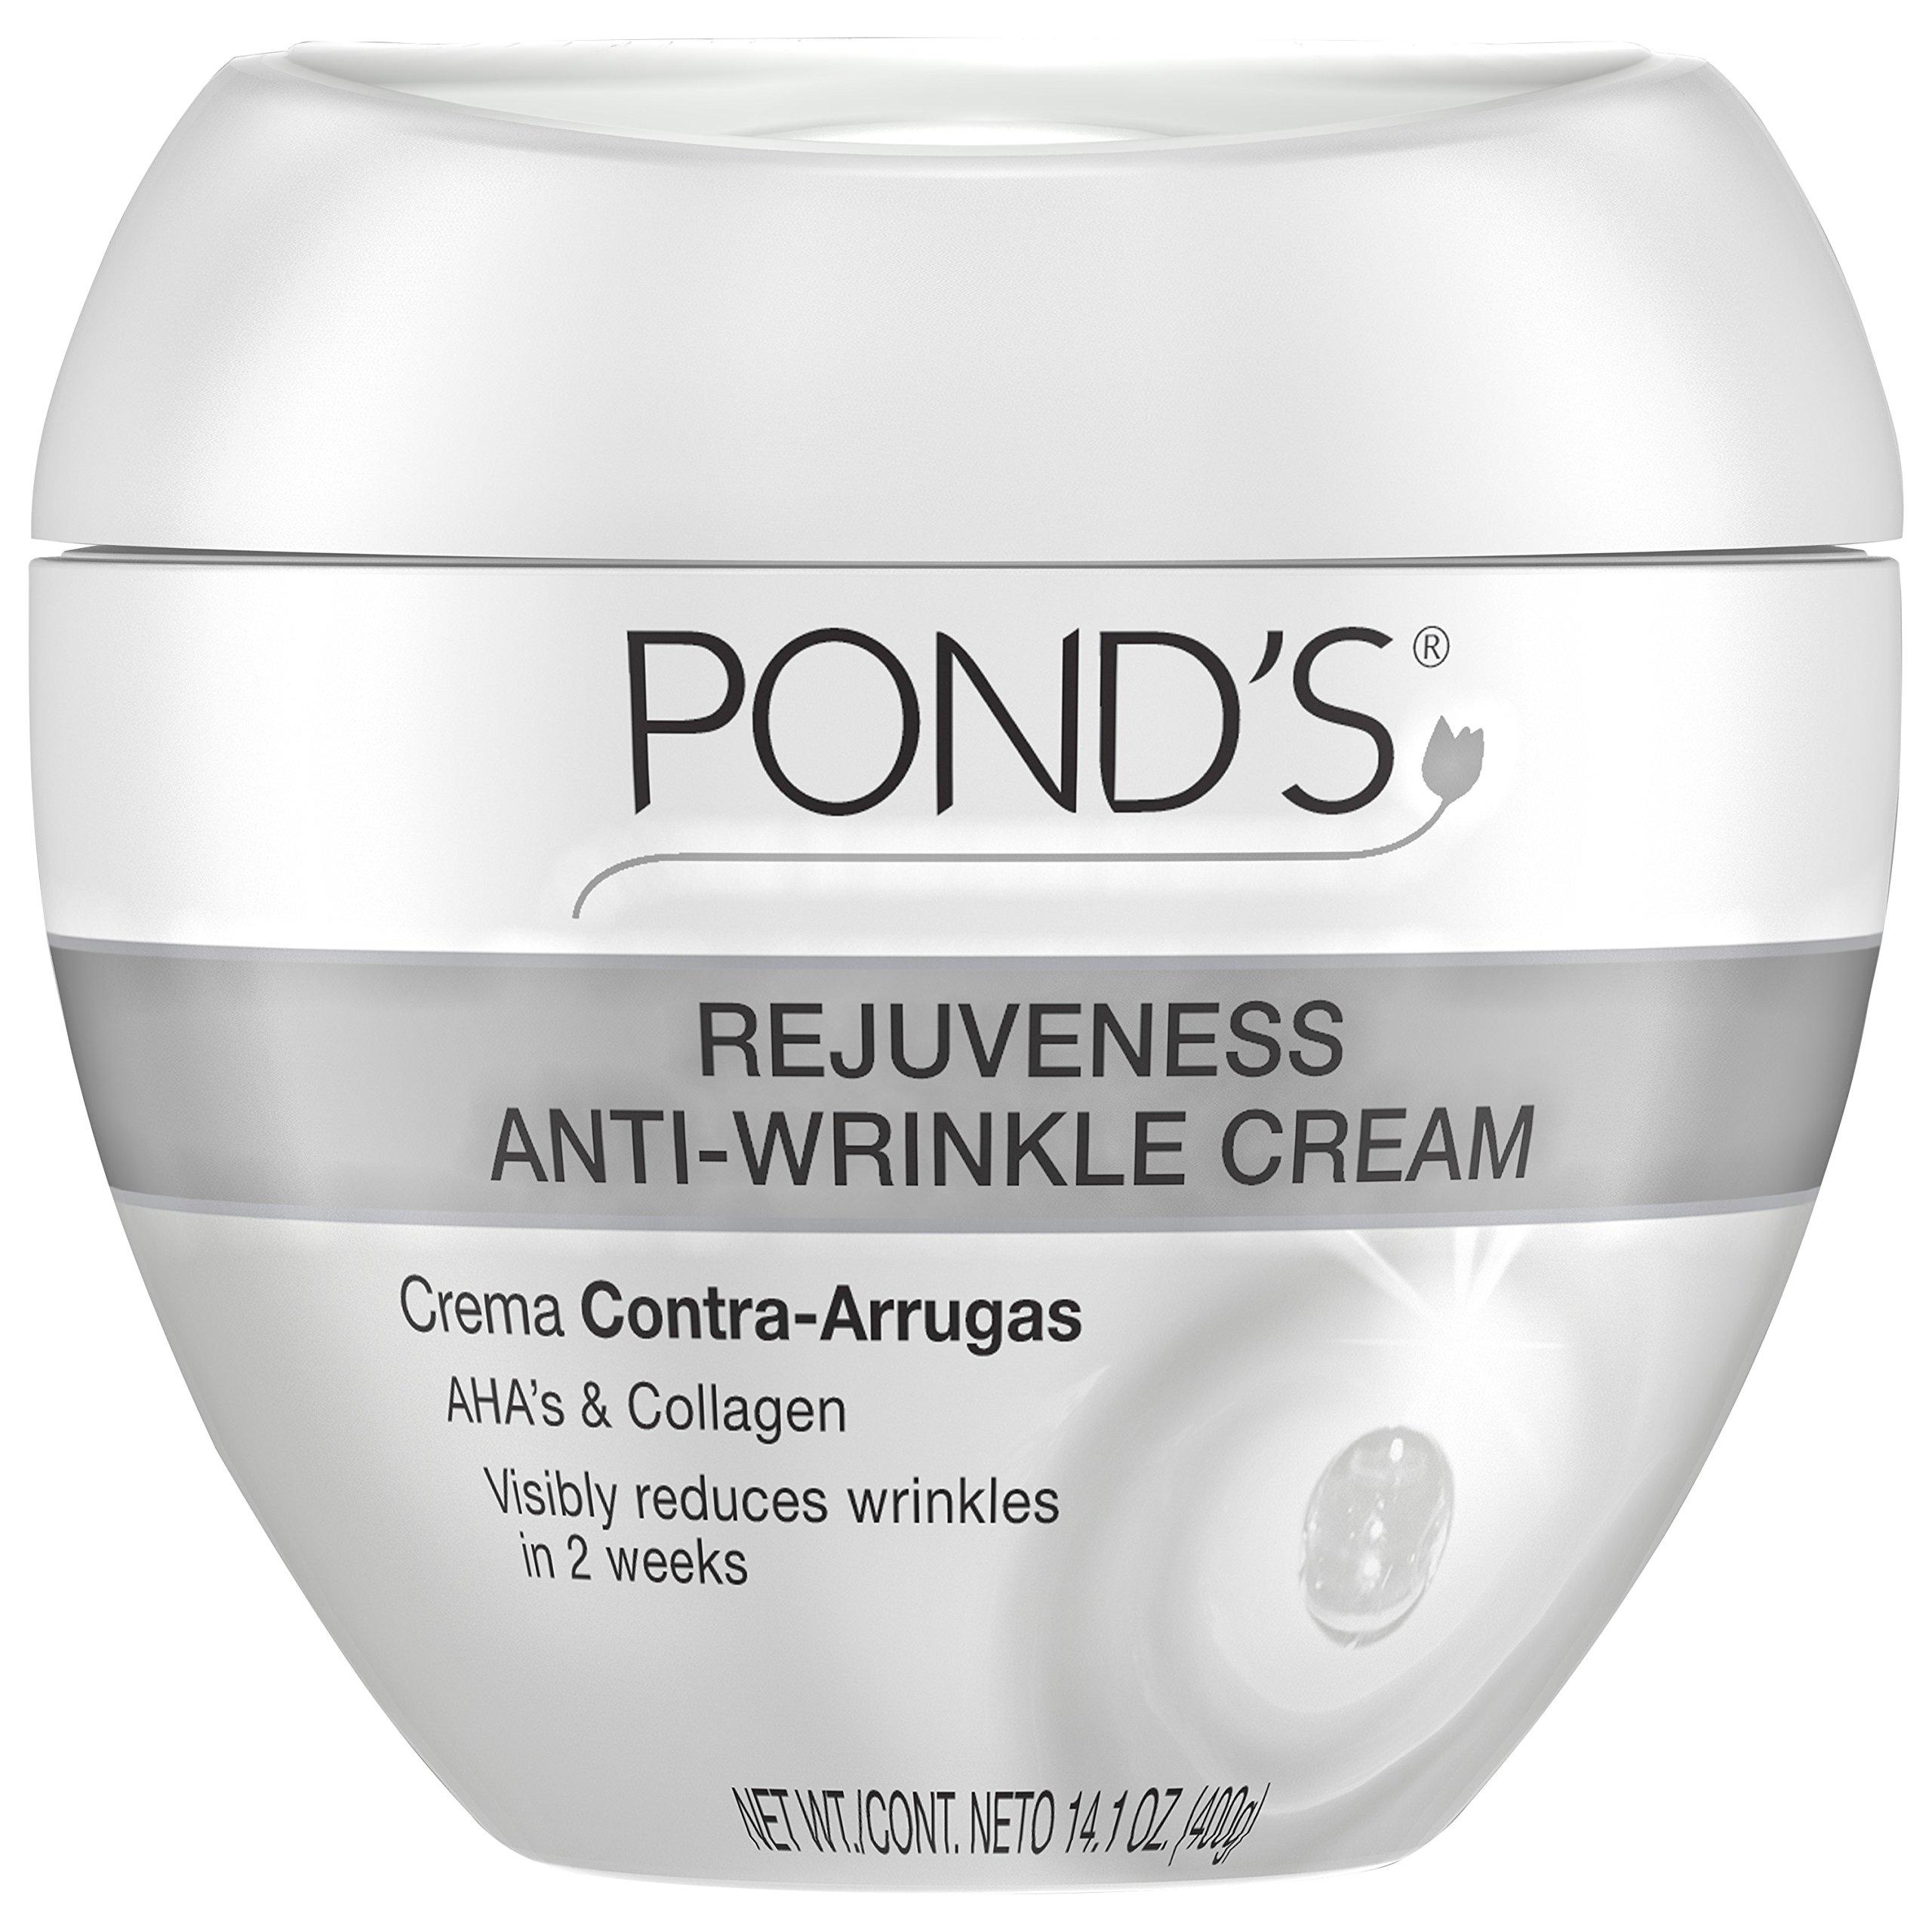 Pond's Rejuveness Anti-Wrinkle Cream, 14.1 oz